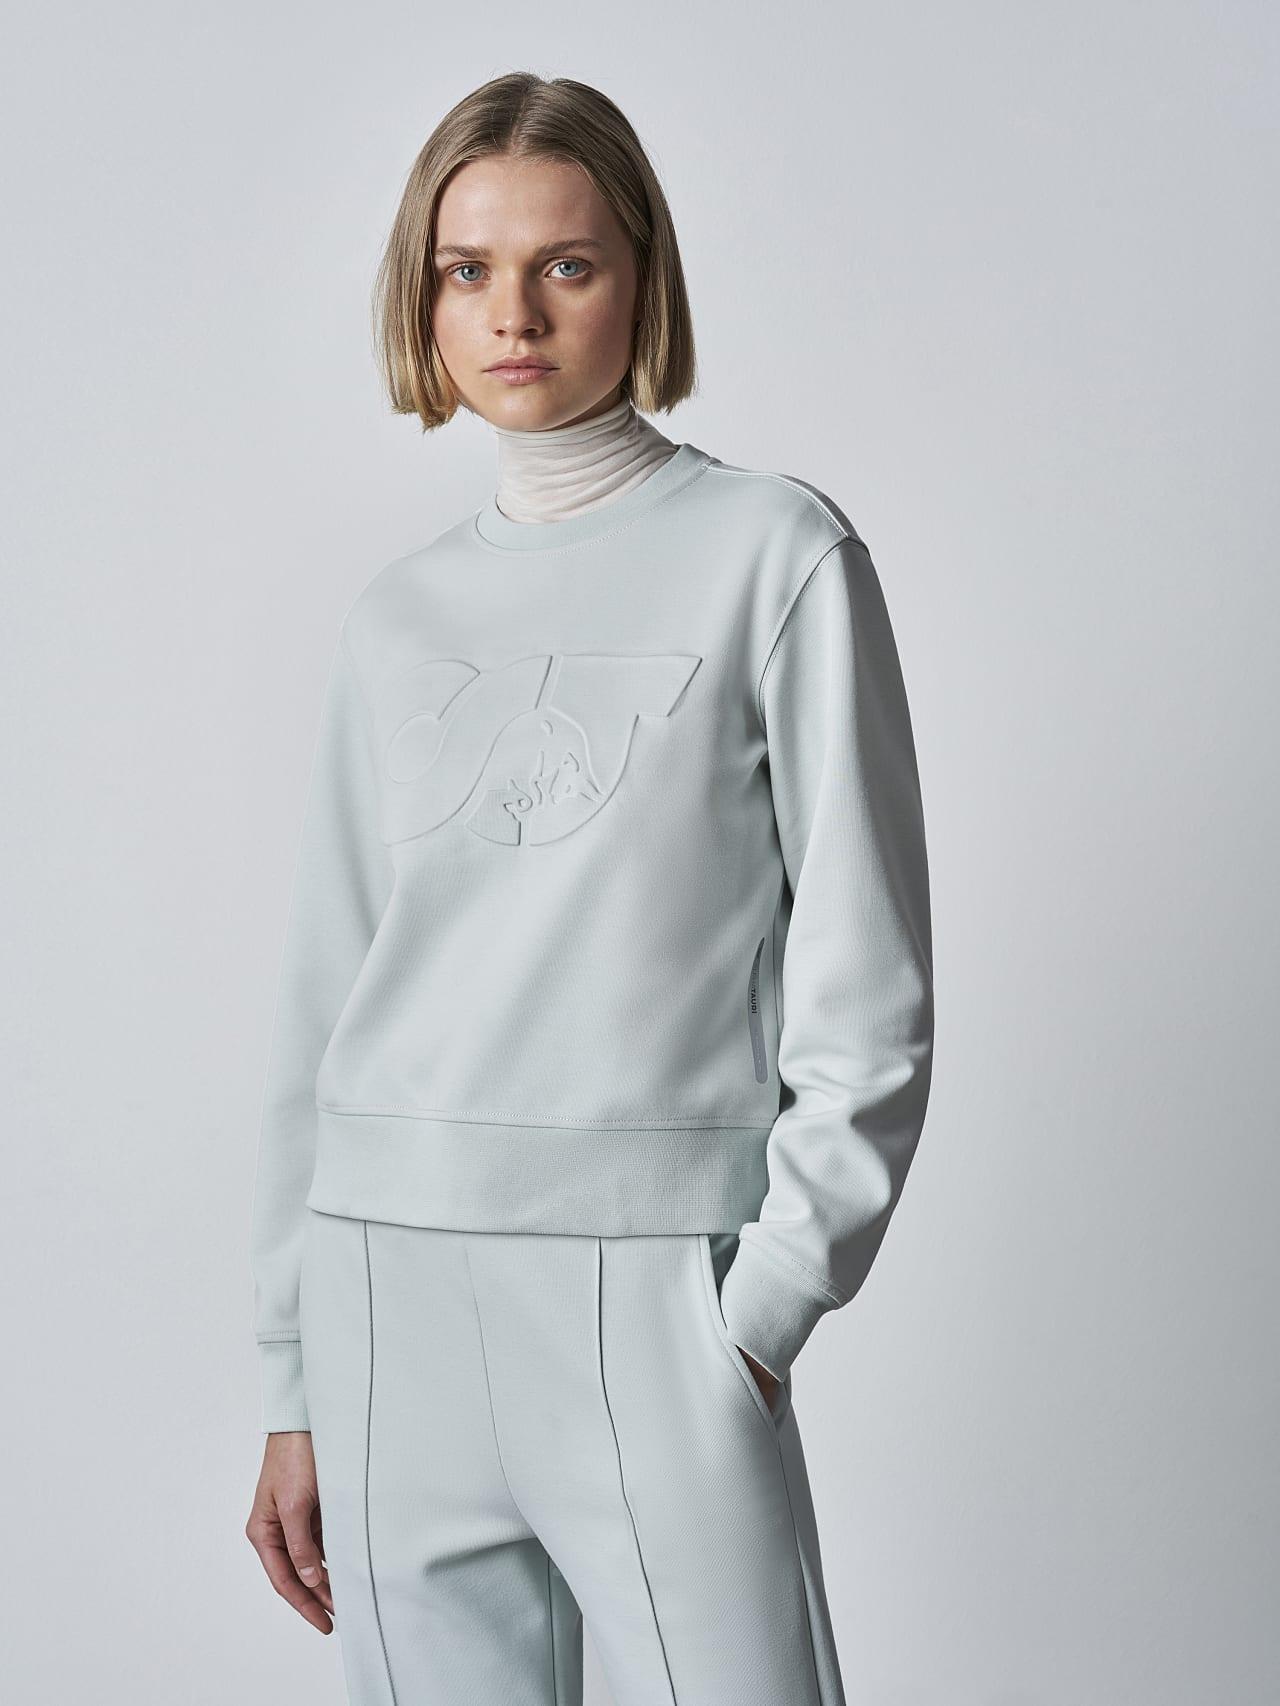 SHINT V1.Y5.02 Premium Logo Sweater Pale Blue  Model shot Alpha Tauri